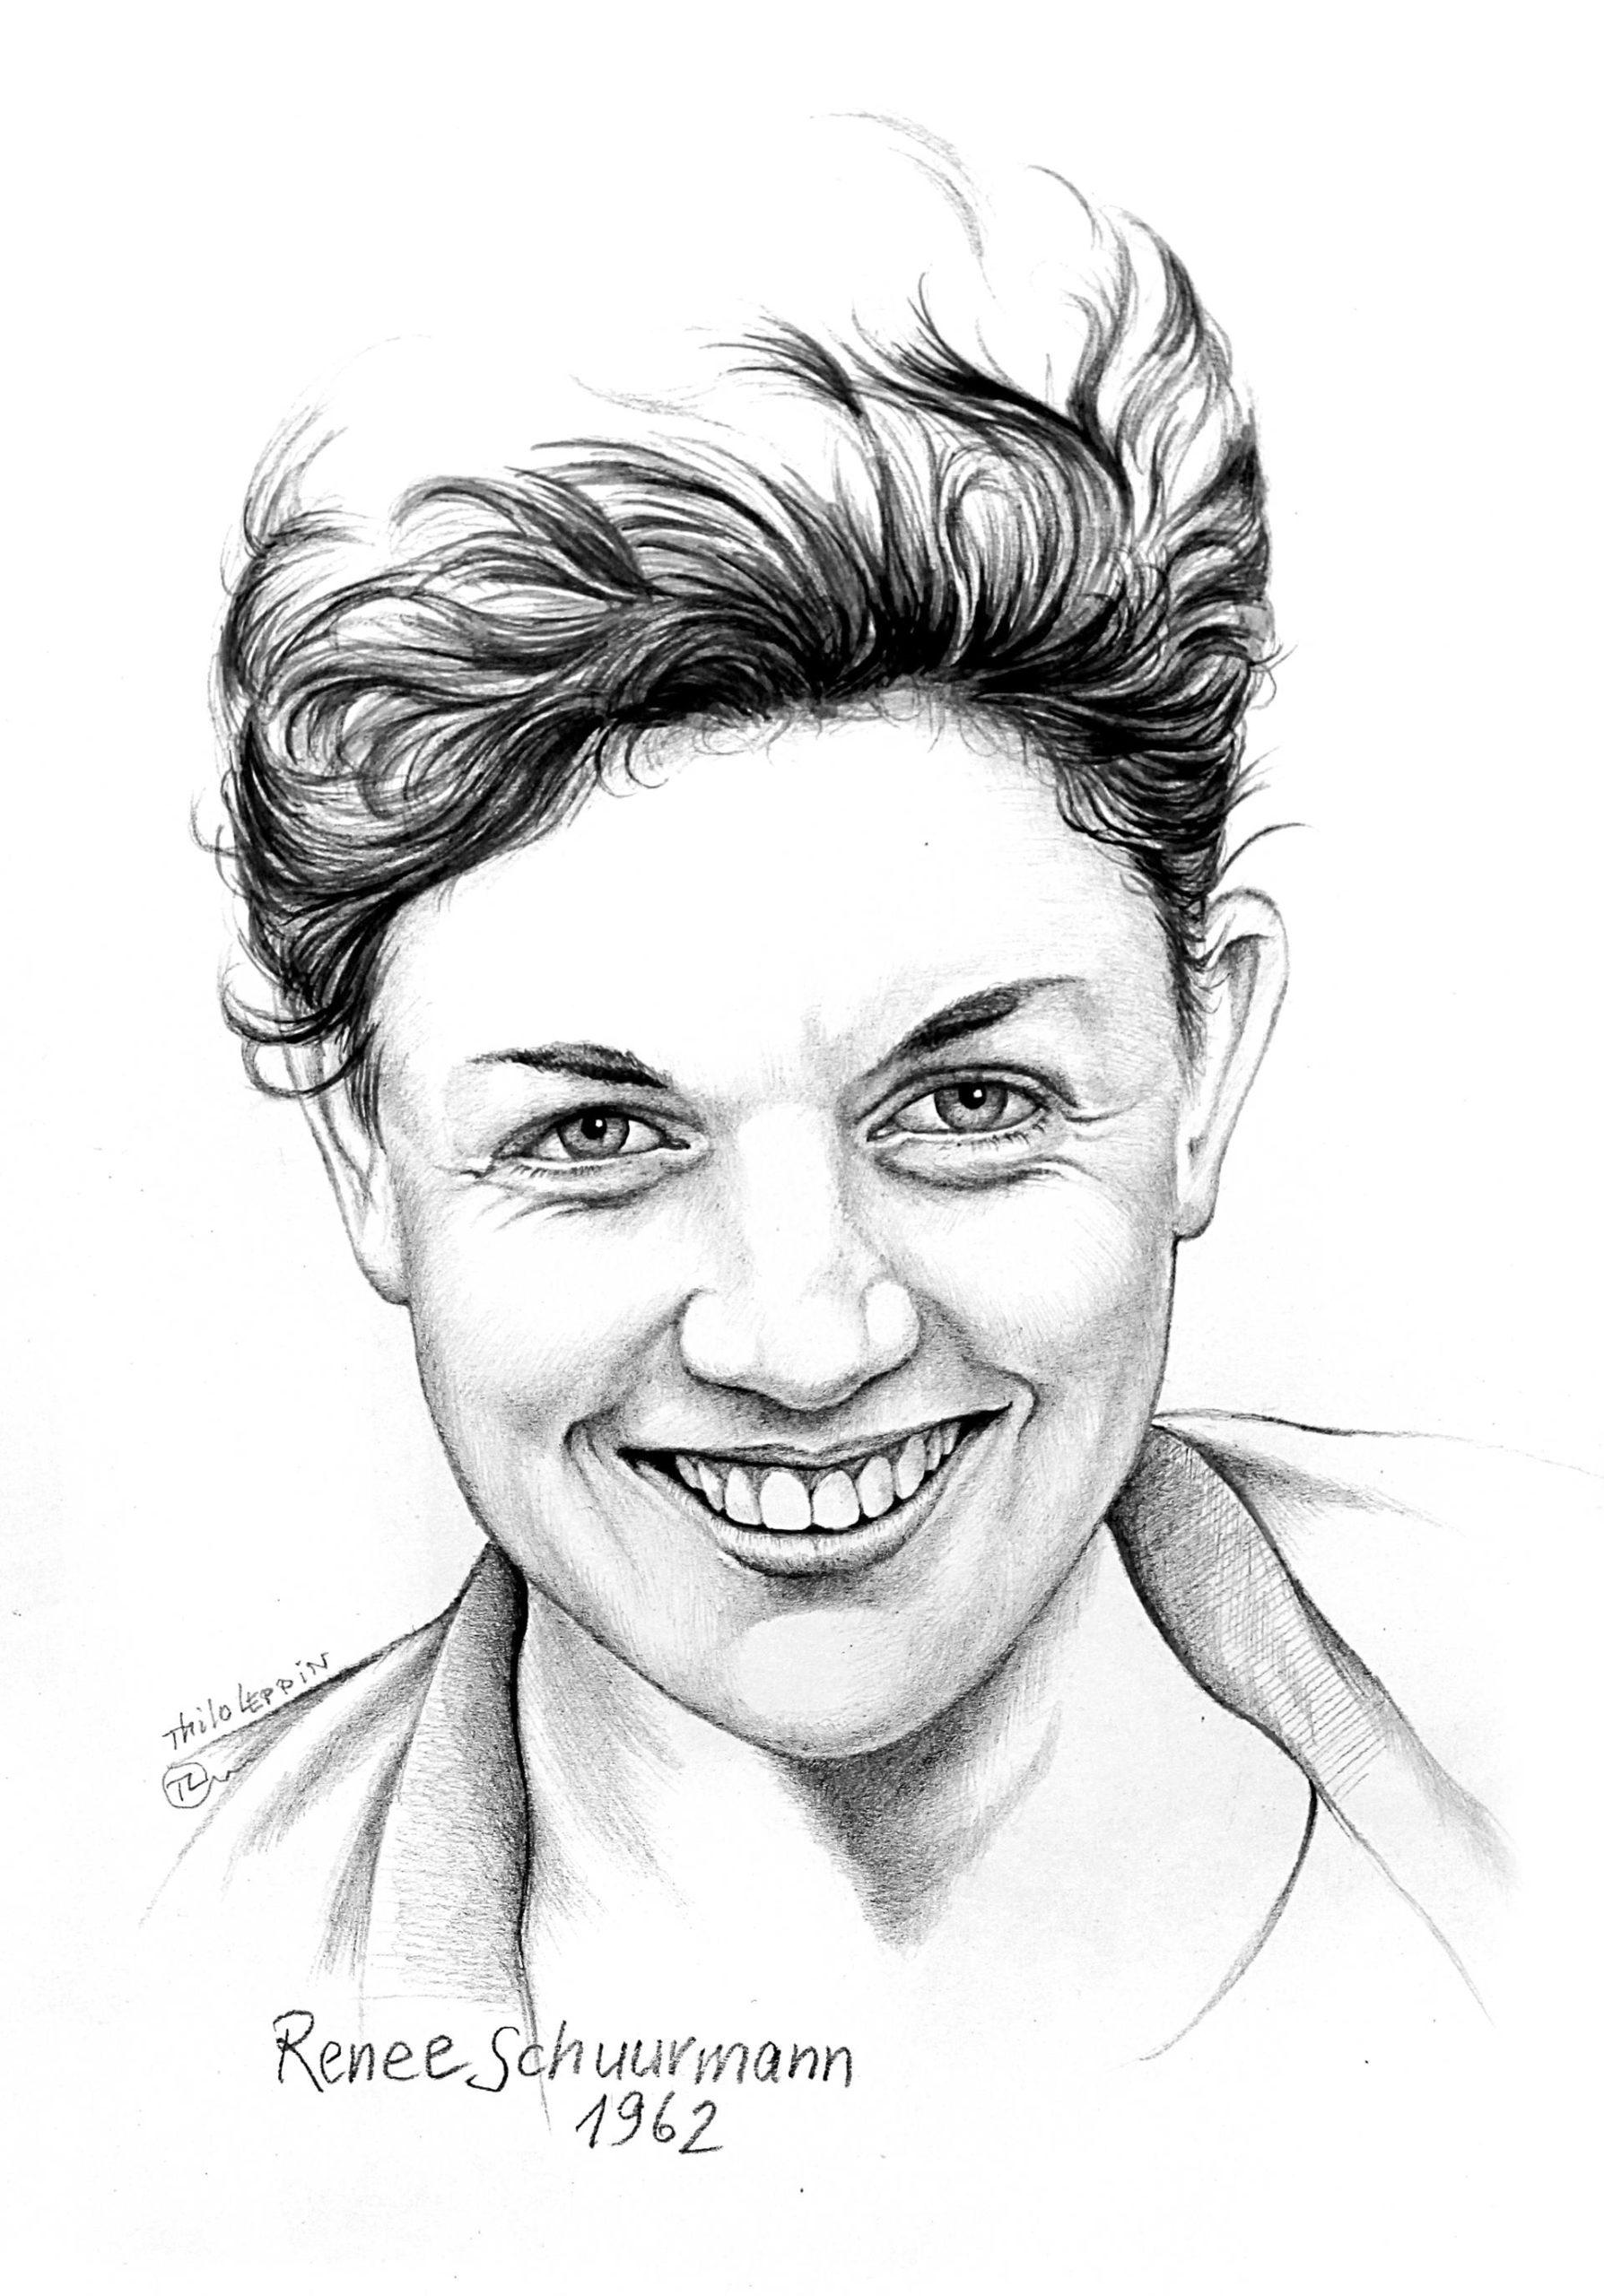 Renée Schuurman